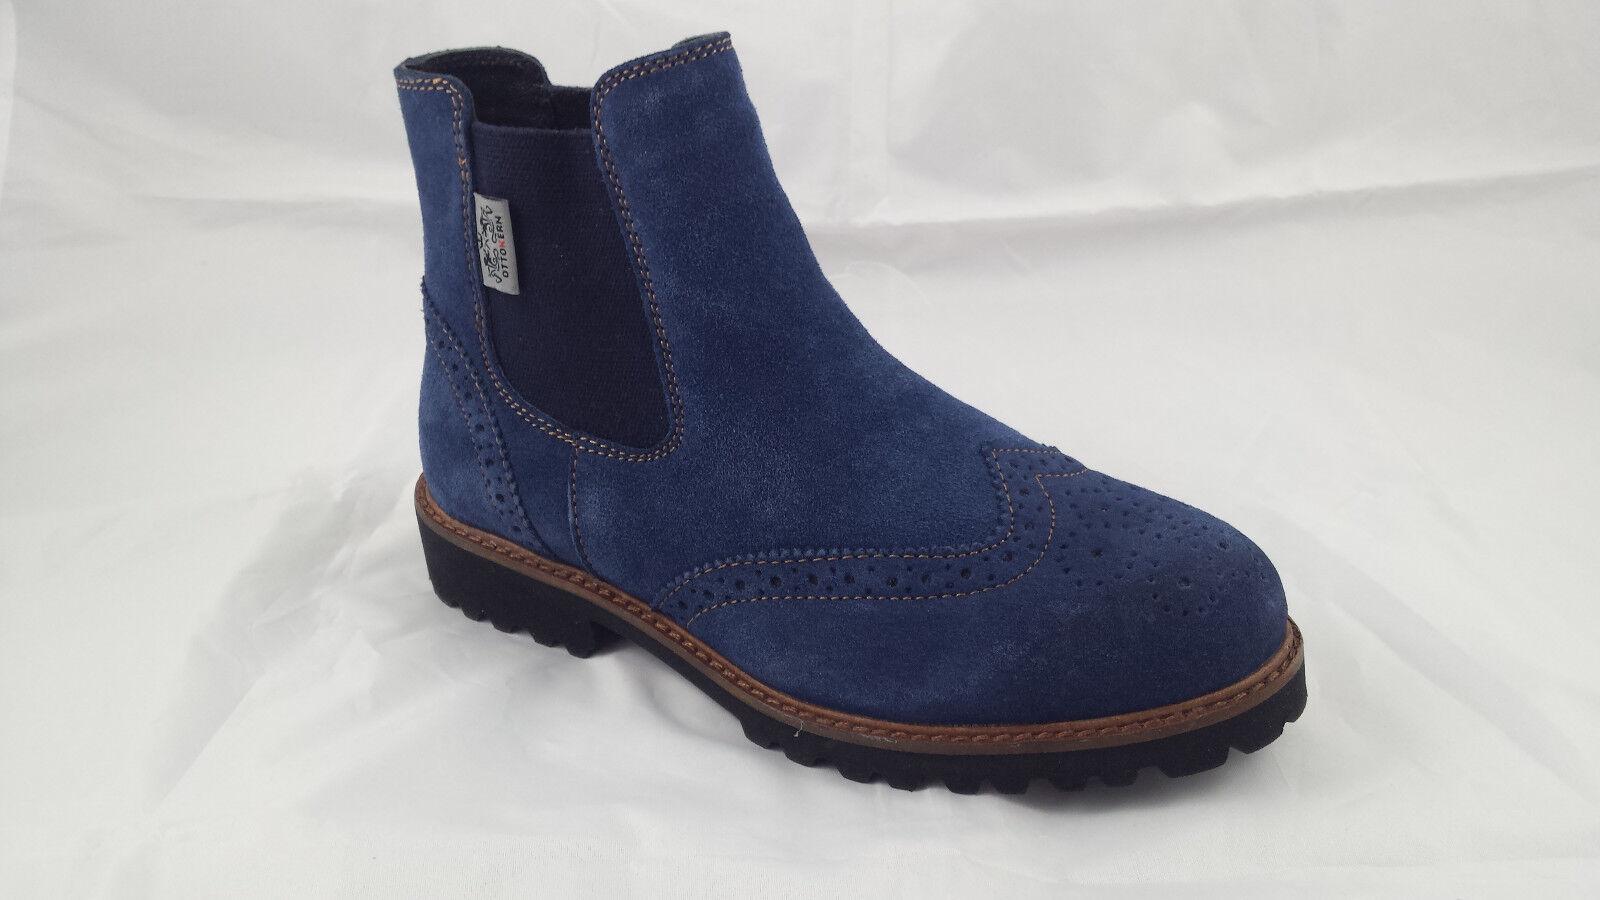 OTTO NAVY KERN 80657 STIEFELETTE Chelsea Stiefel NAVY OTTO Blau Gr 37 NEU bcb5a3